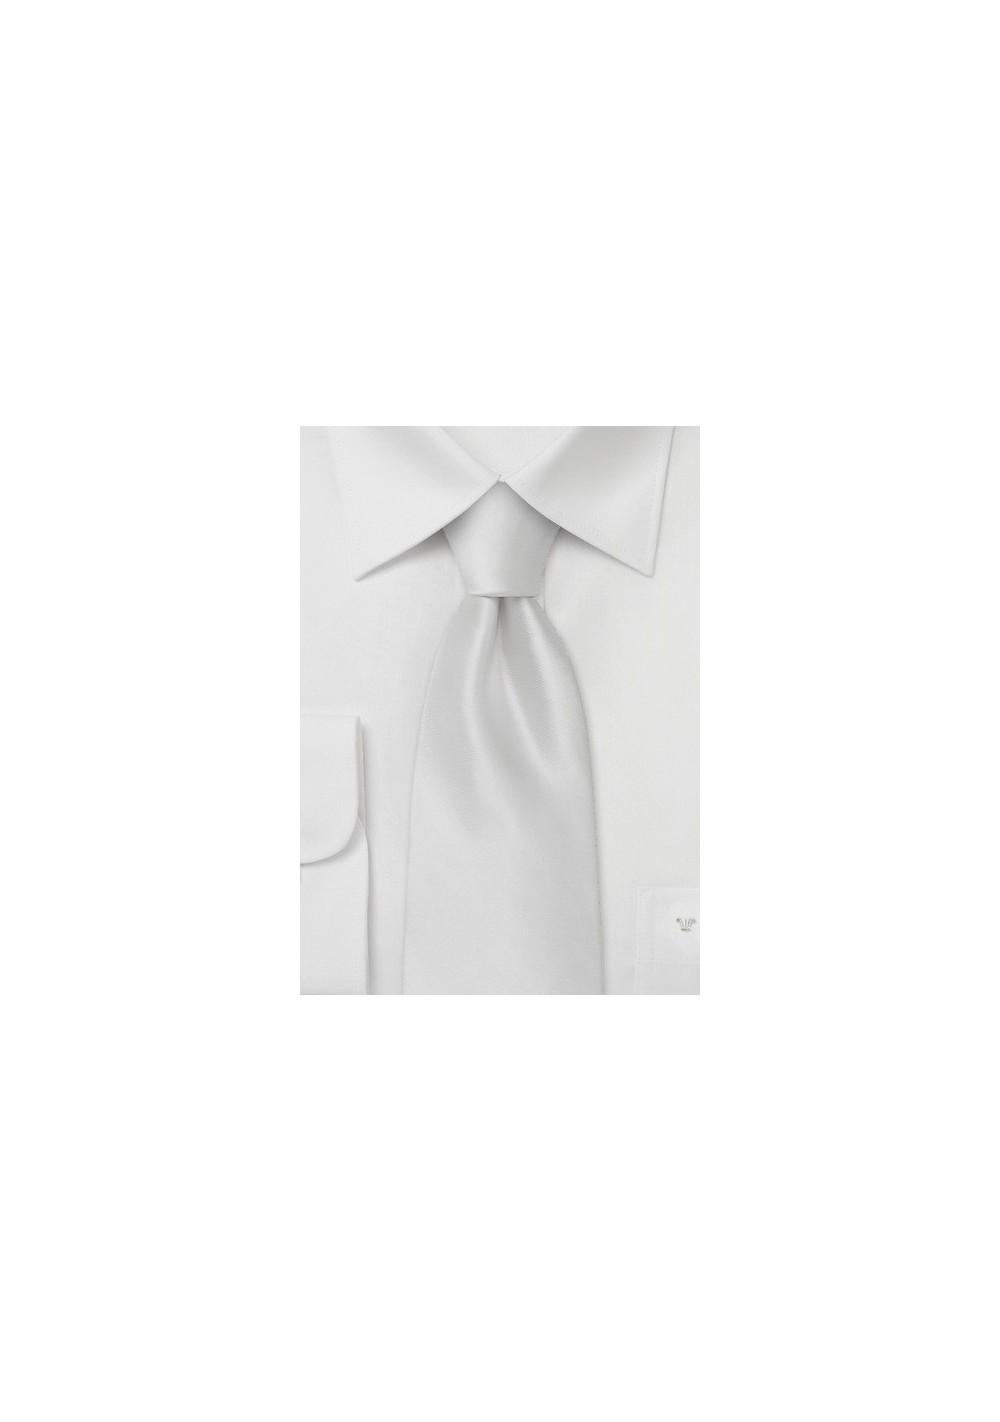 White silk tie  -  Formal silk tie popular choice for wedding parties